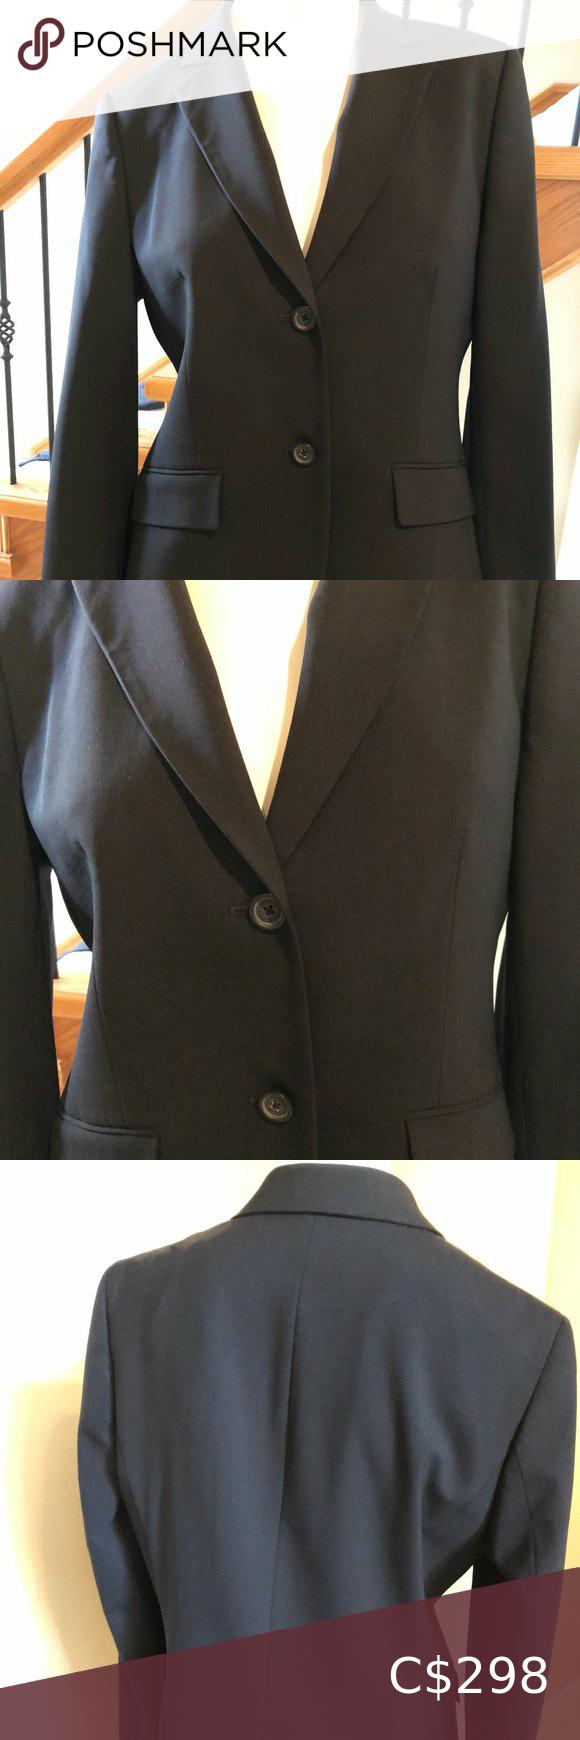 Brooks Brothers Tollegno 1900 Suit Jacket sz 8 EUC